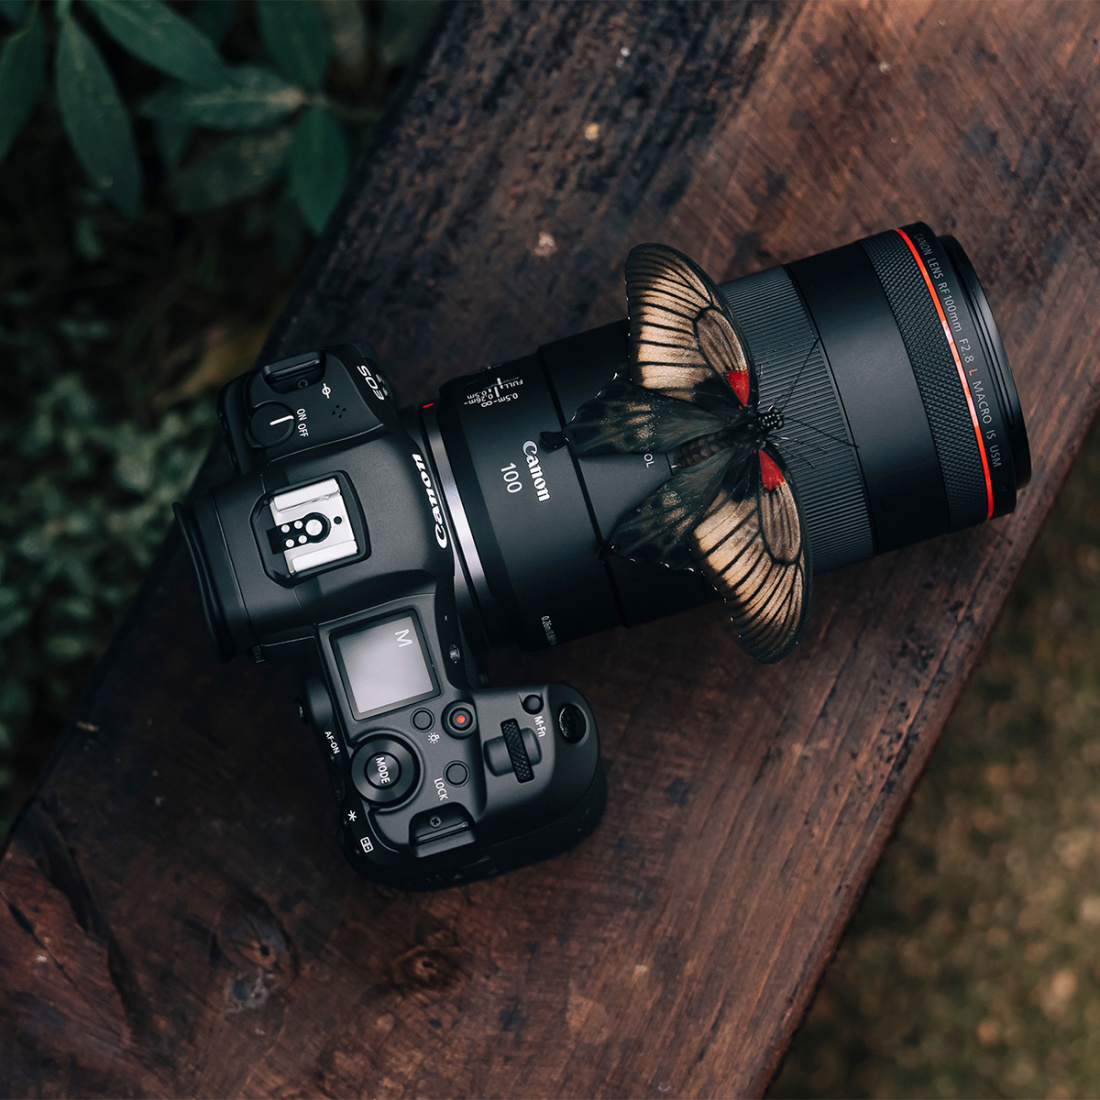 Canon RF 100mm f/2.8 L Macro IS USM